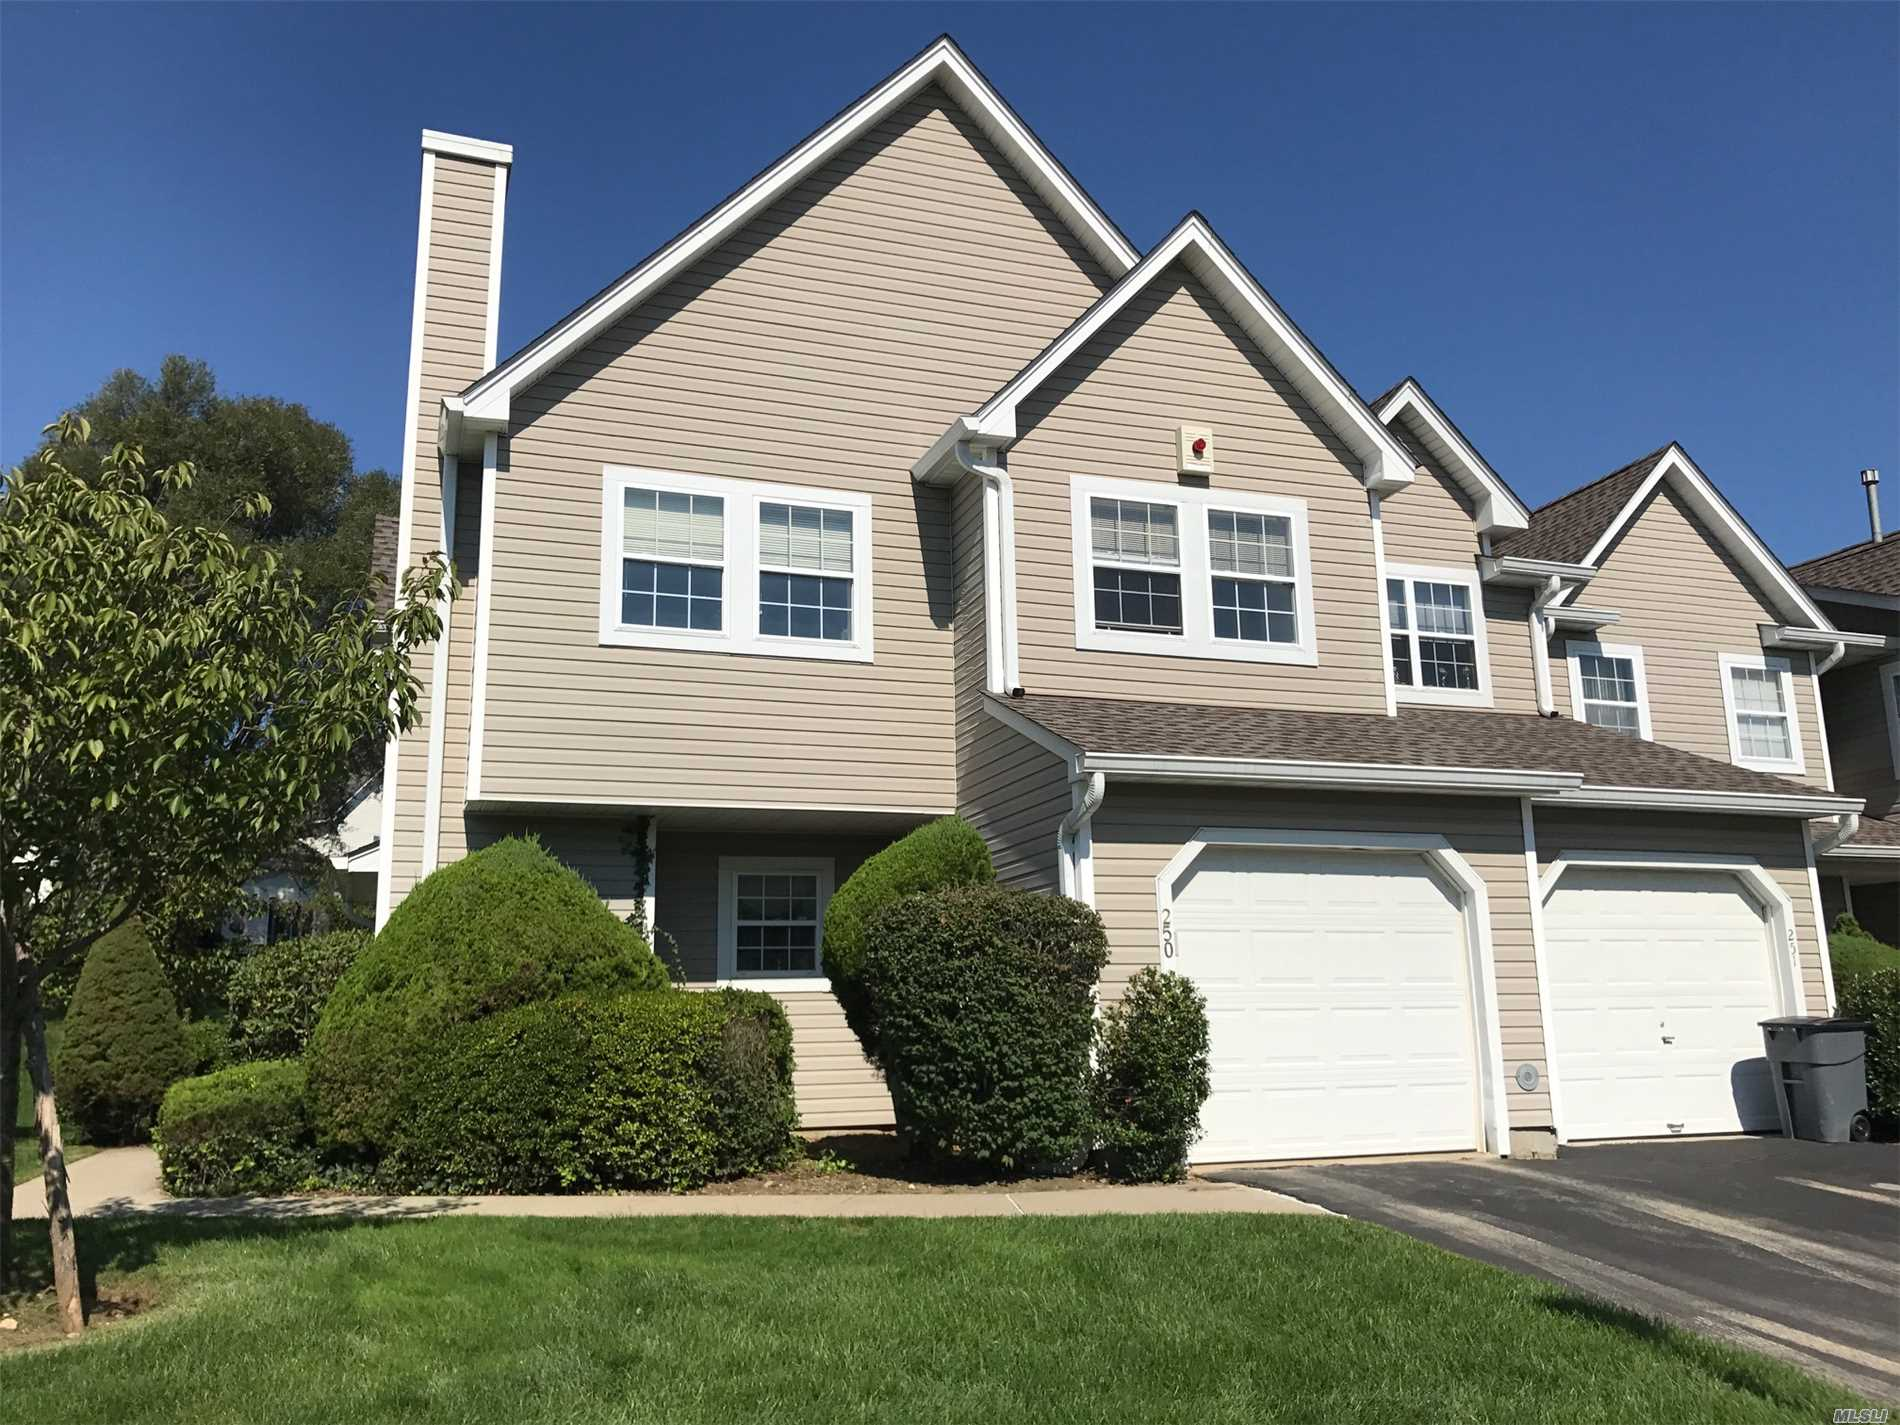 Property for sale at 250 Erin Ln, East Setauket,  NY 11733